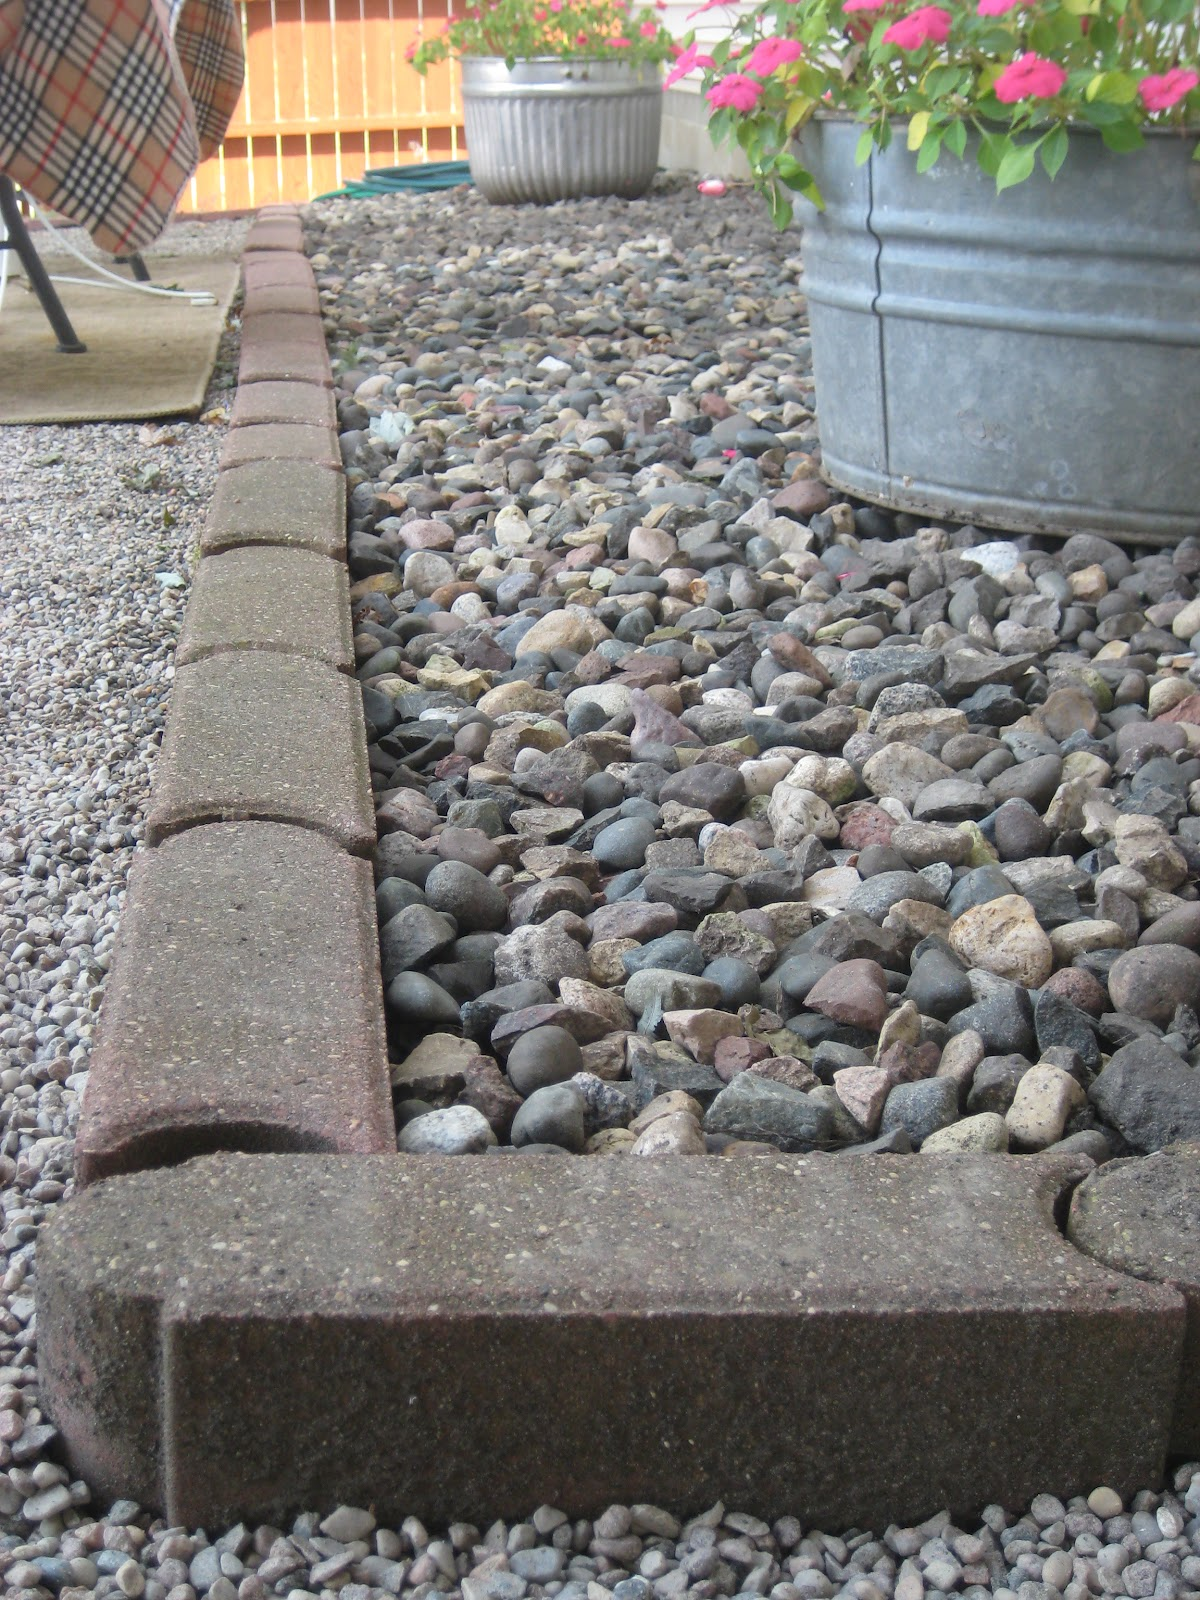 Home office decorating ideas backyard ideas with stones - Home office design ideas with stones trails ...